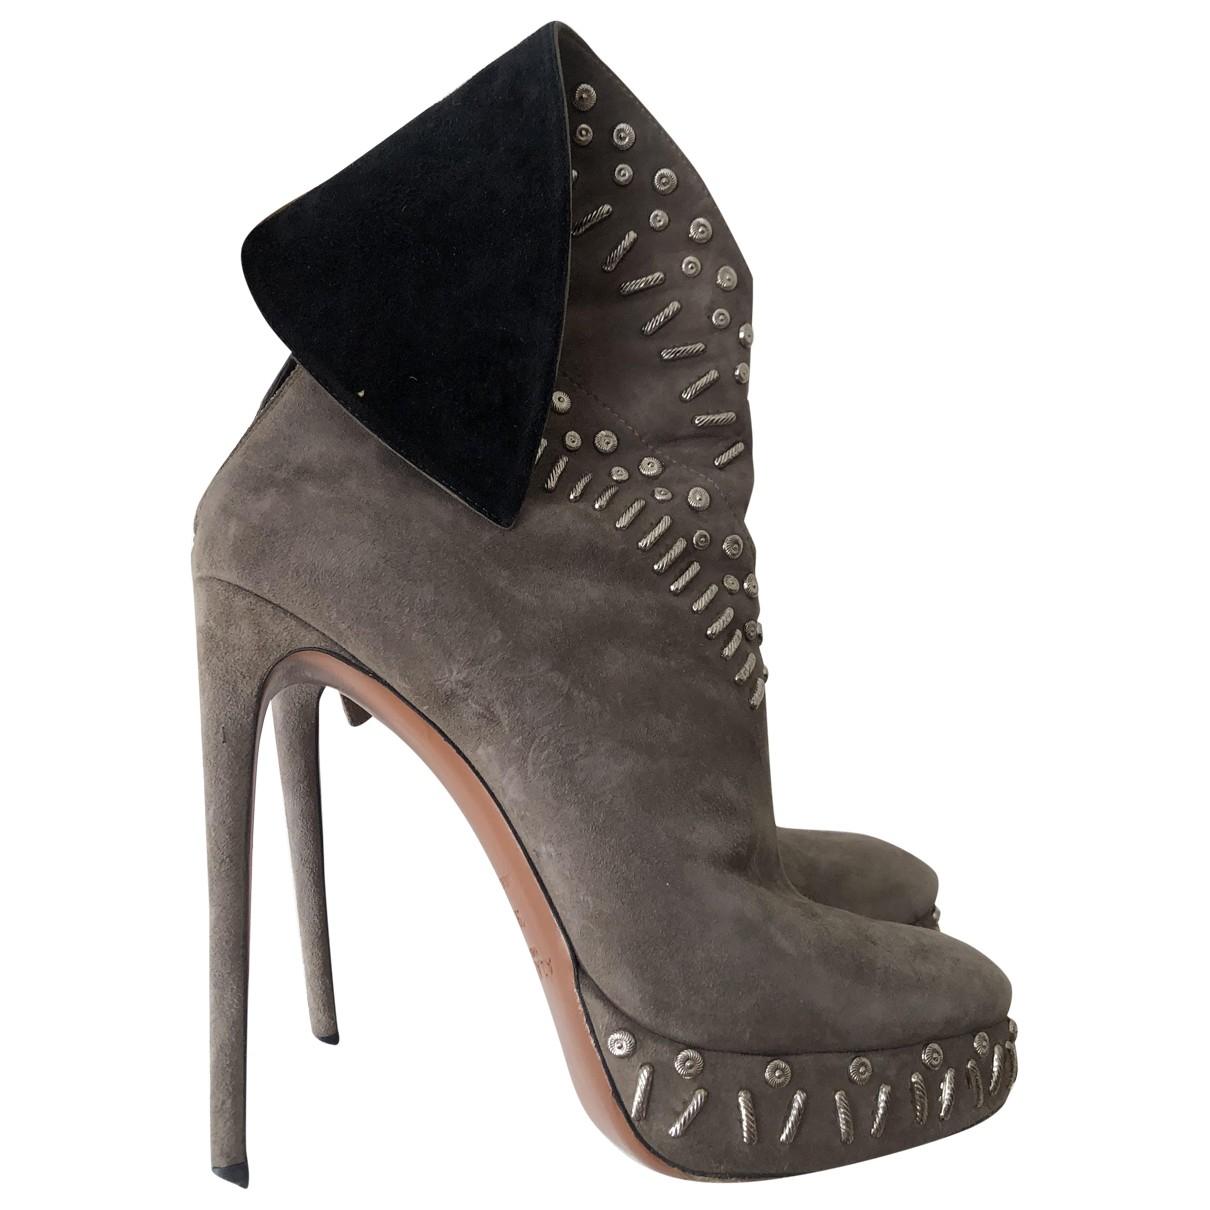 Alaïa \N Beige Suede Ankle boots for Women 39 EU